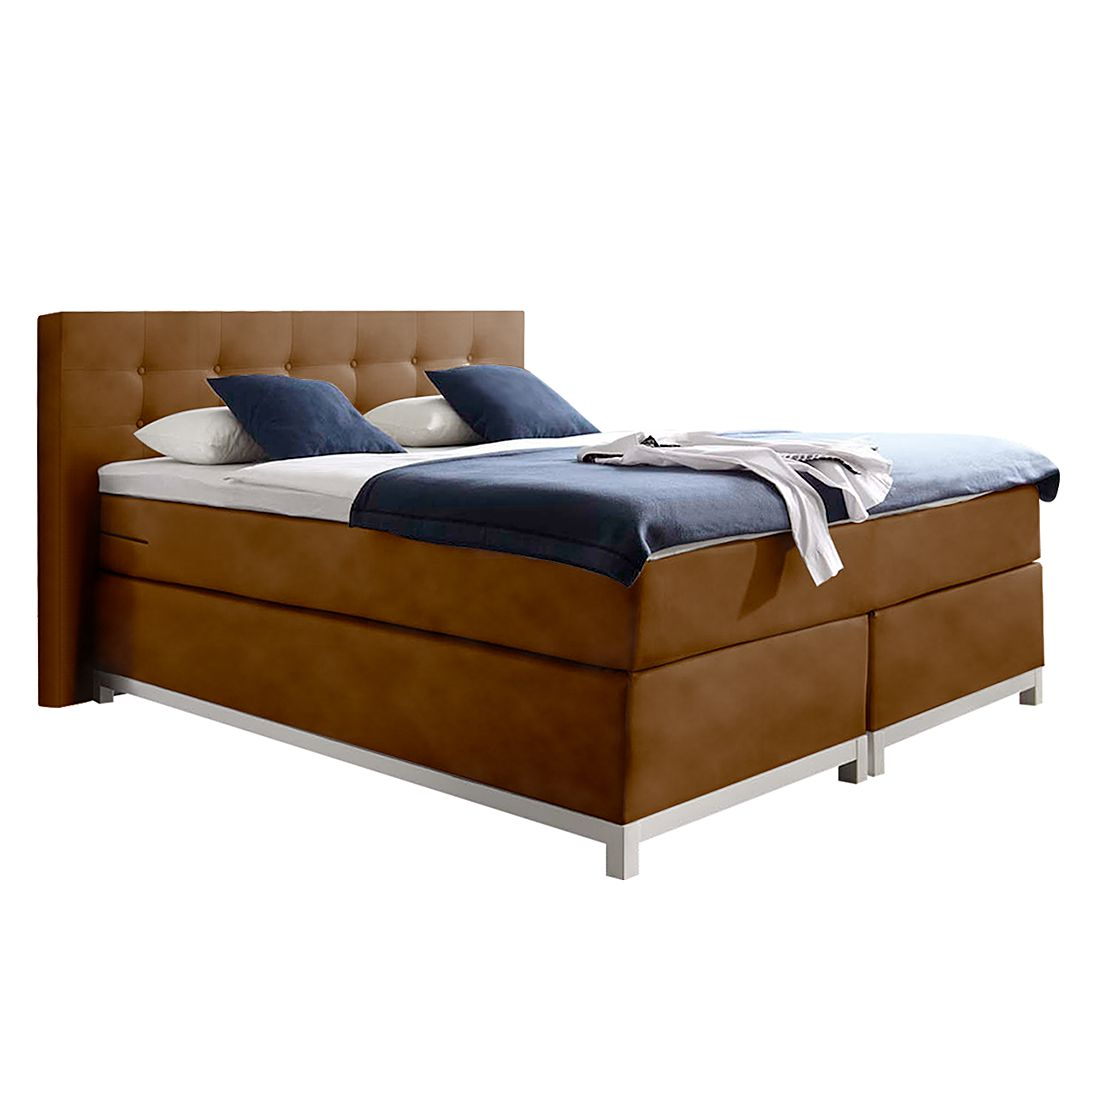 boxspringbett male kunstleder 100 x 200cm h3 ab 80 kg vintage cognac nova dream. Black Bedroom Furniture Sets. Home Design Ideas